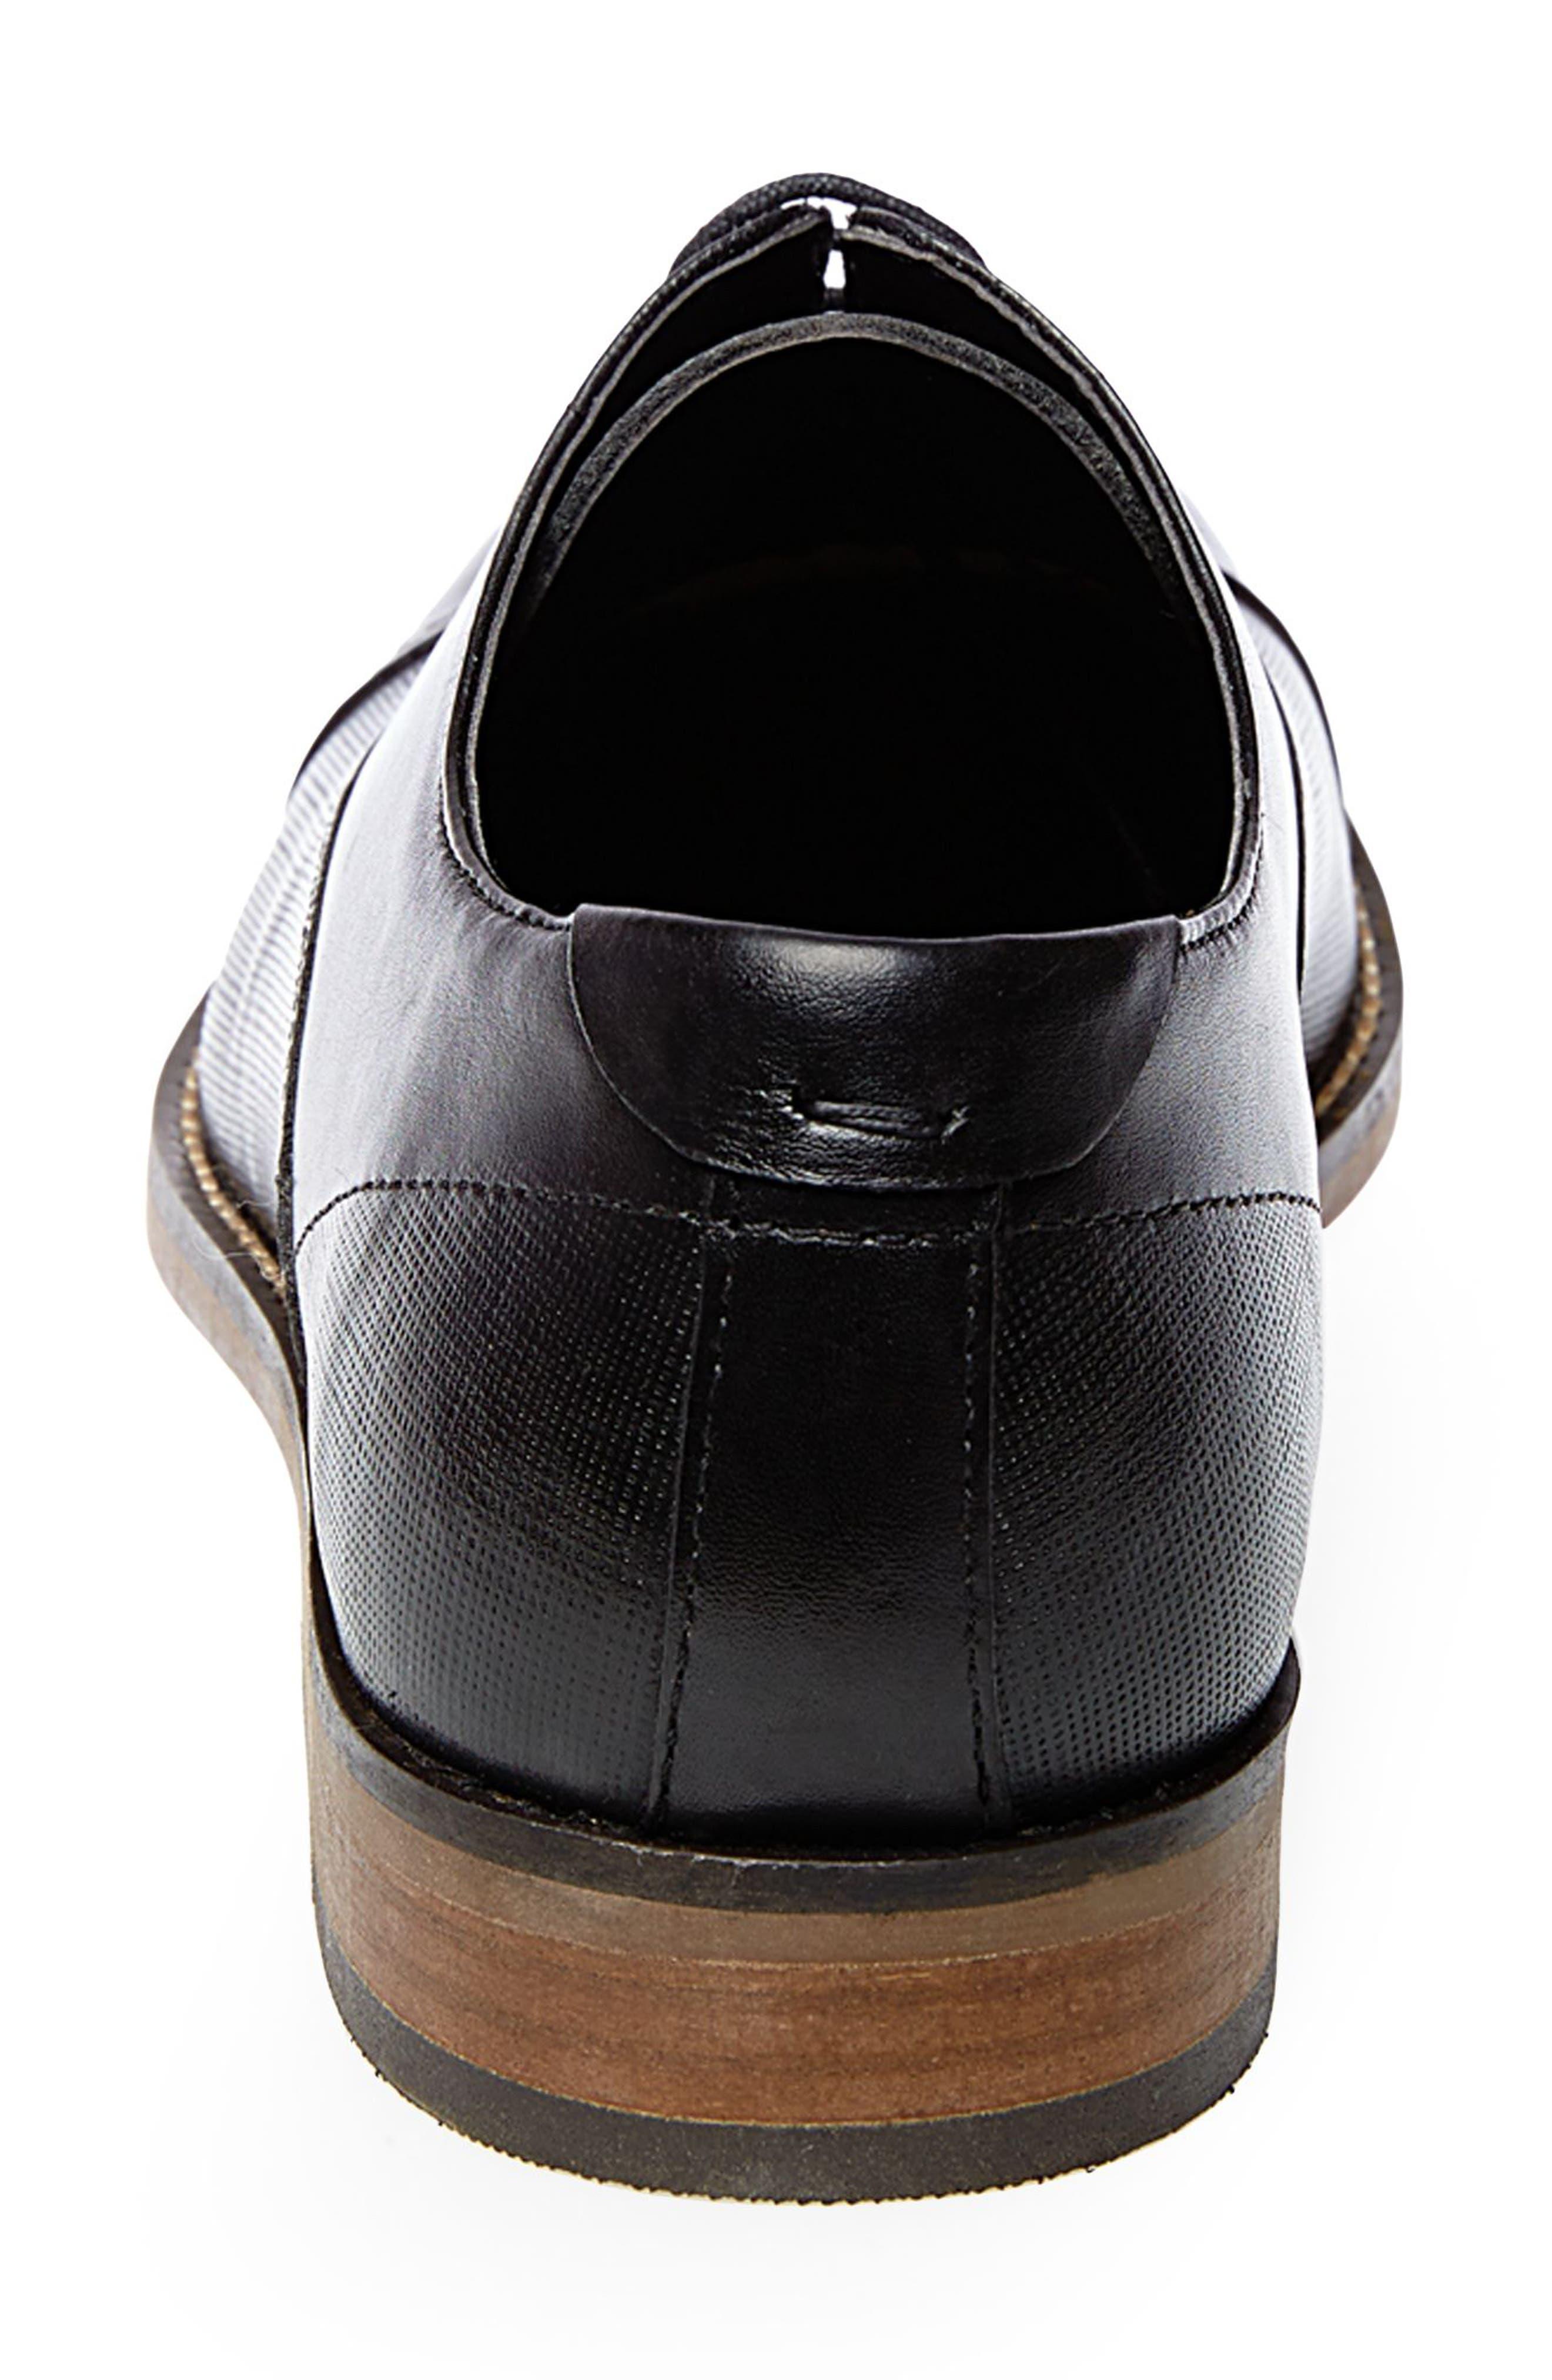 STEVE MADDEN, Finnich Textured Cap Toe Oxford, Alternate thumbnail 2, color, BLACK